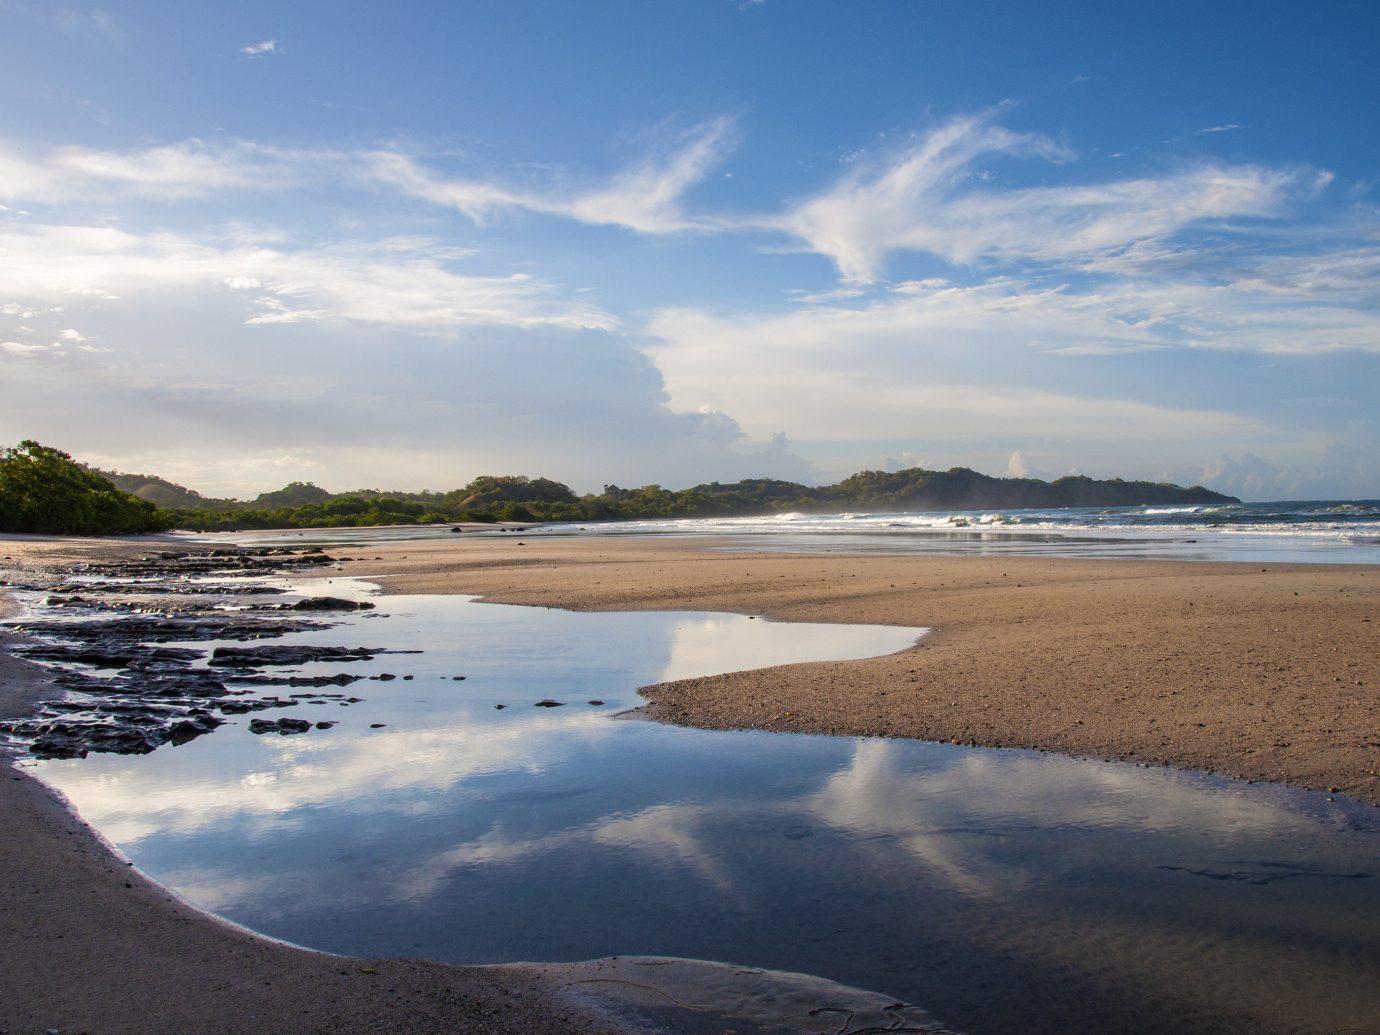 Beach on the Nicoya Peninsula in Costa Rica